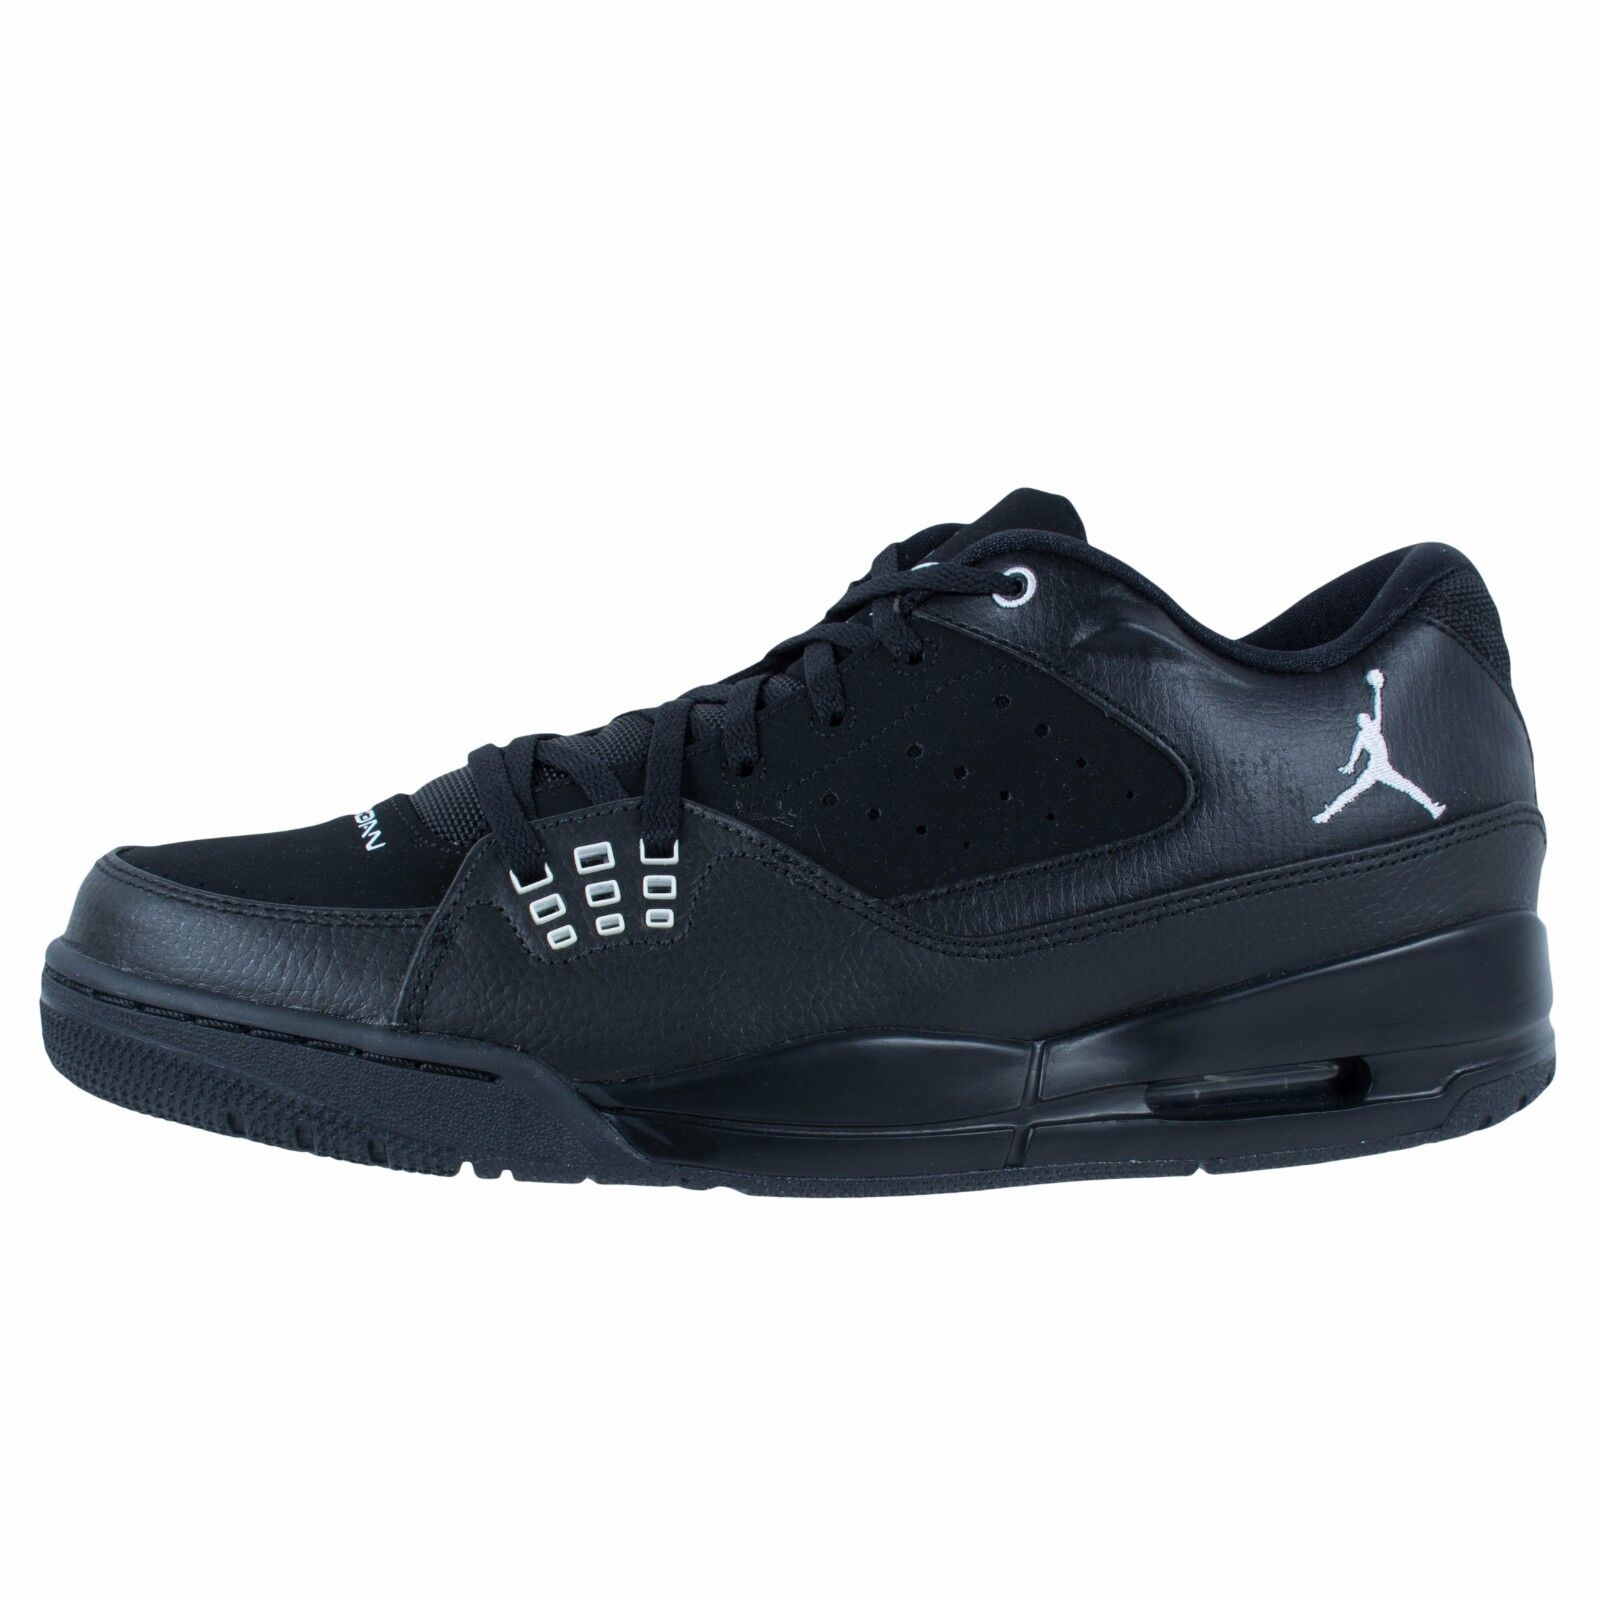 Nike Jordan SC-1 Low Black Leather 599929-010 shoes Men